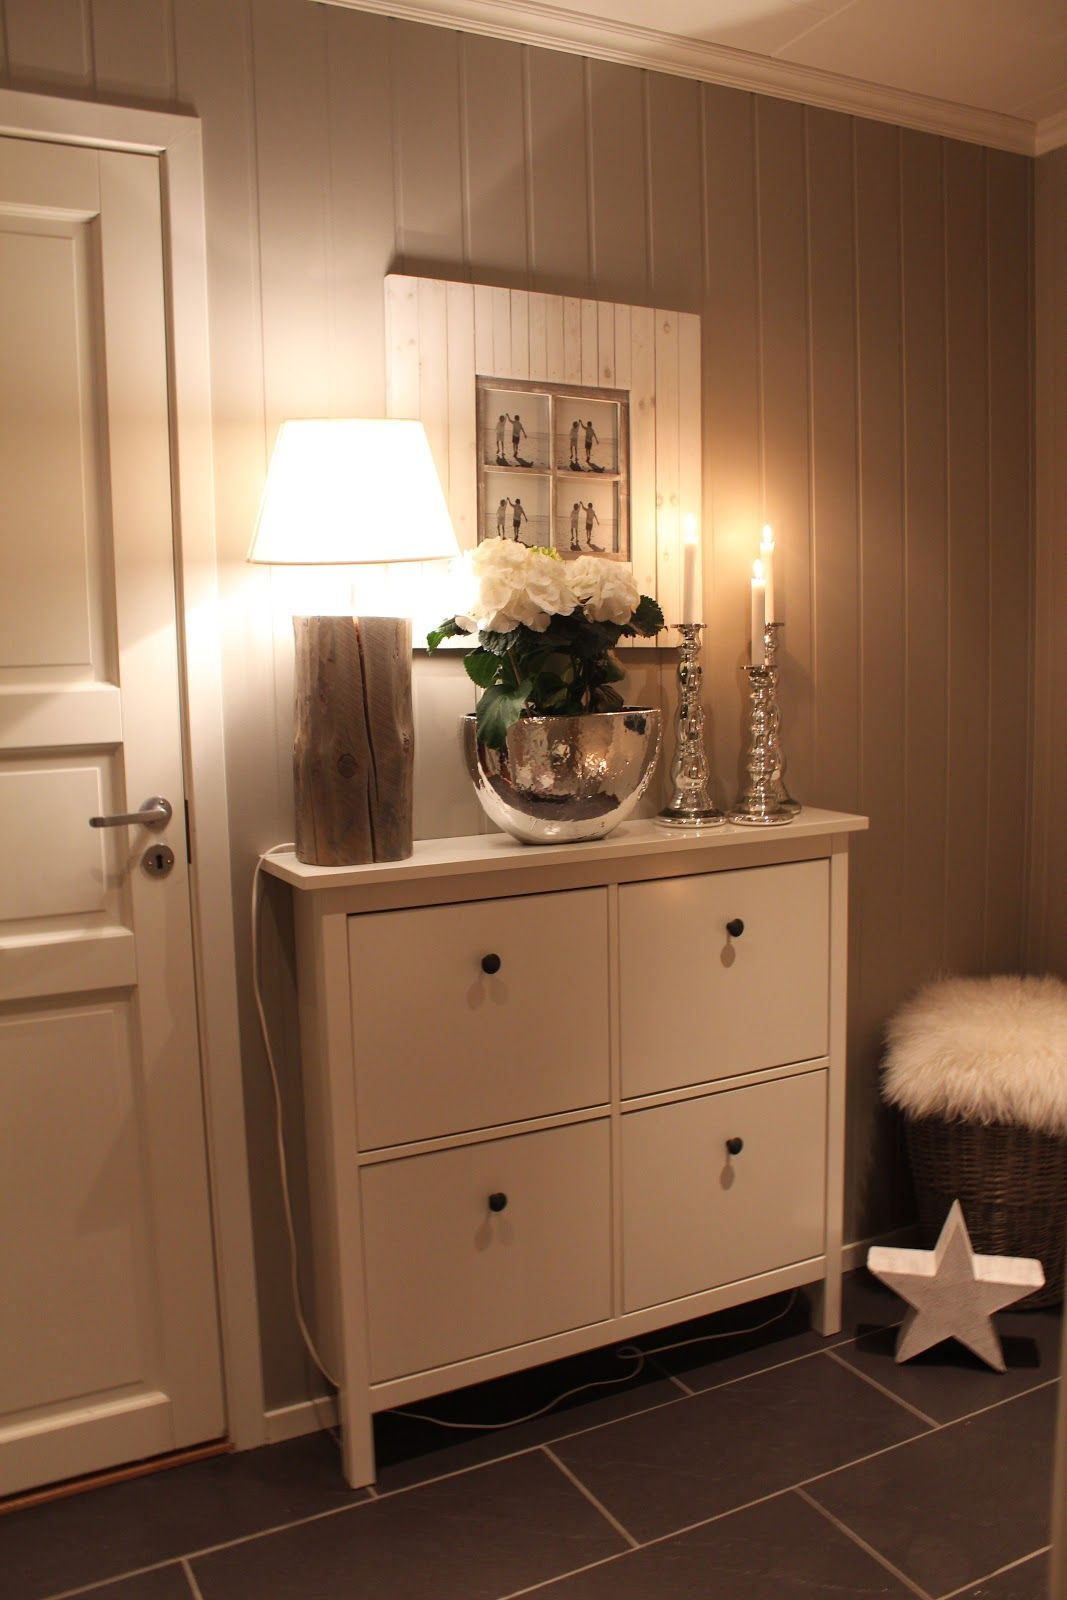 Lindevegen hallway ideas pinterest recibidor - Entradas de casa ikea ...